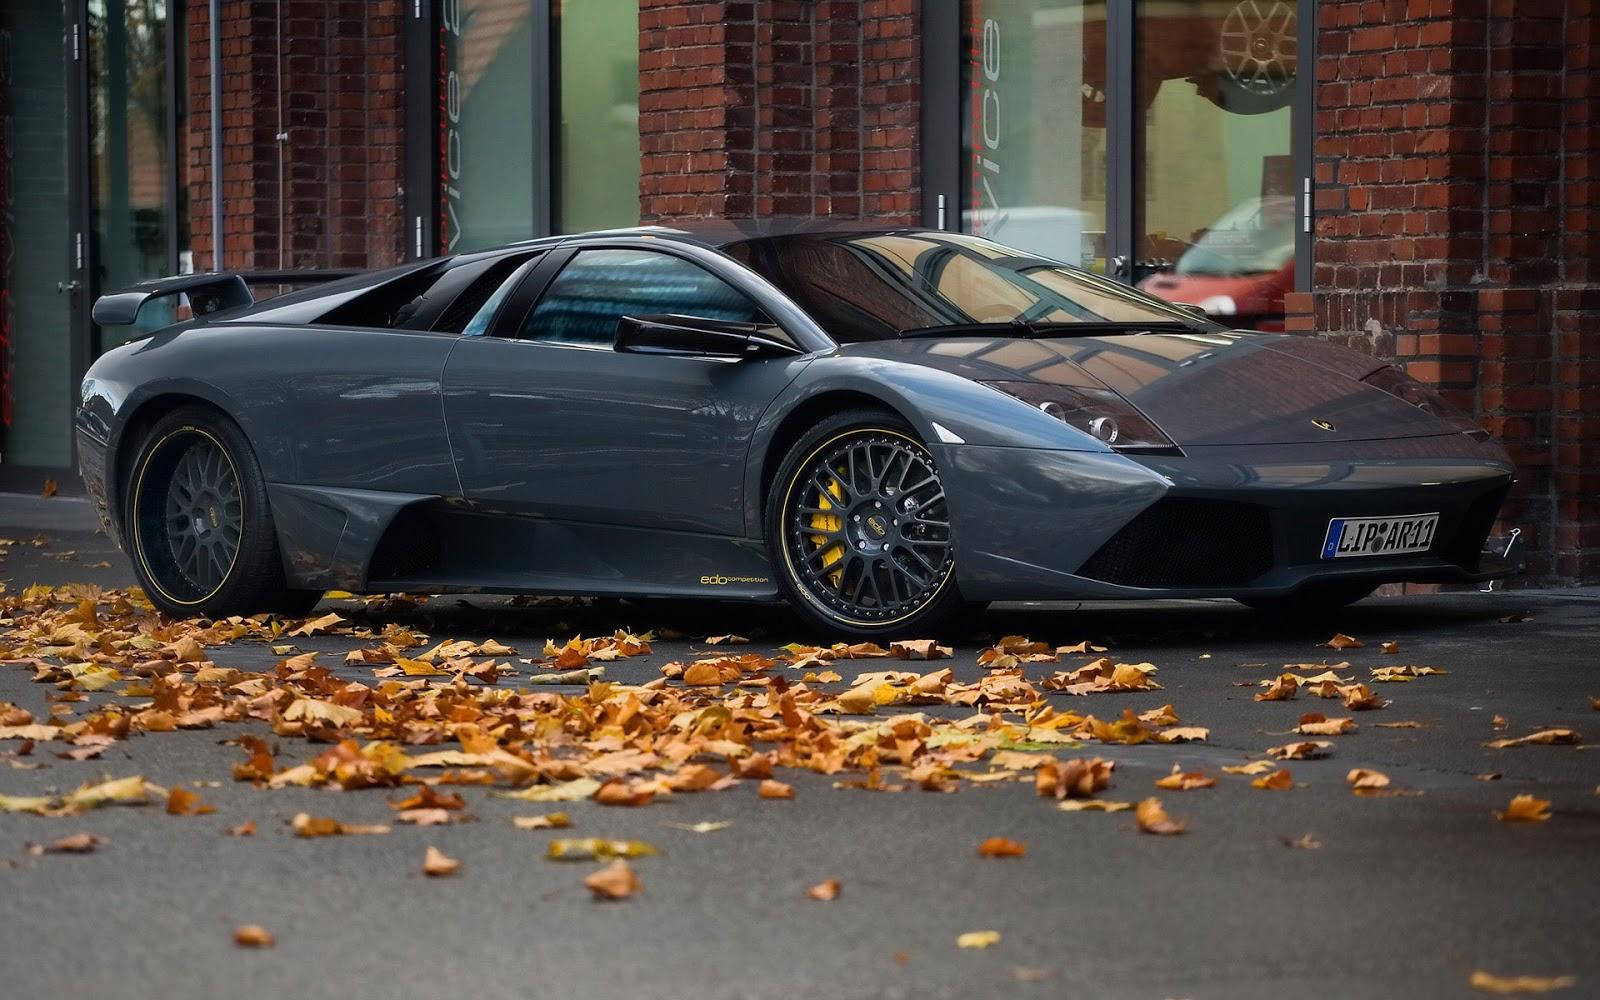 Parked Stylish Lamborghini Wallpaper